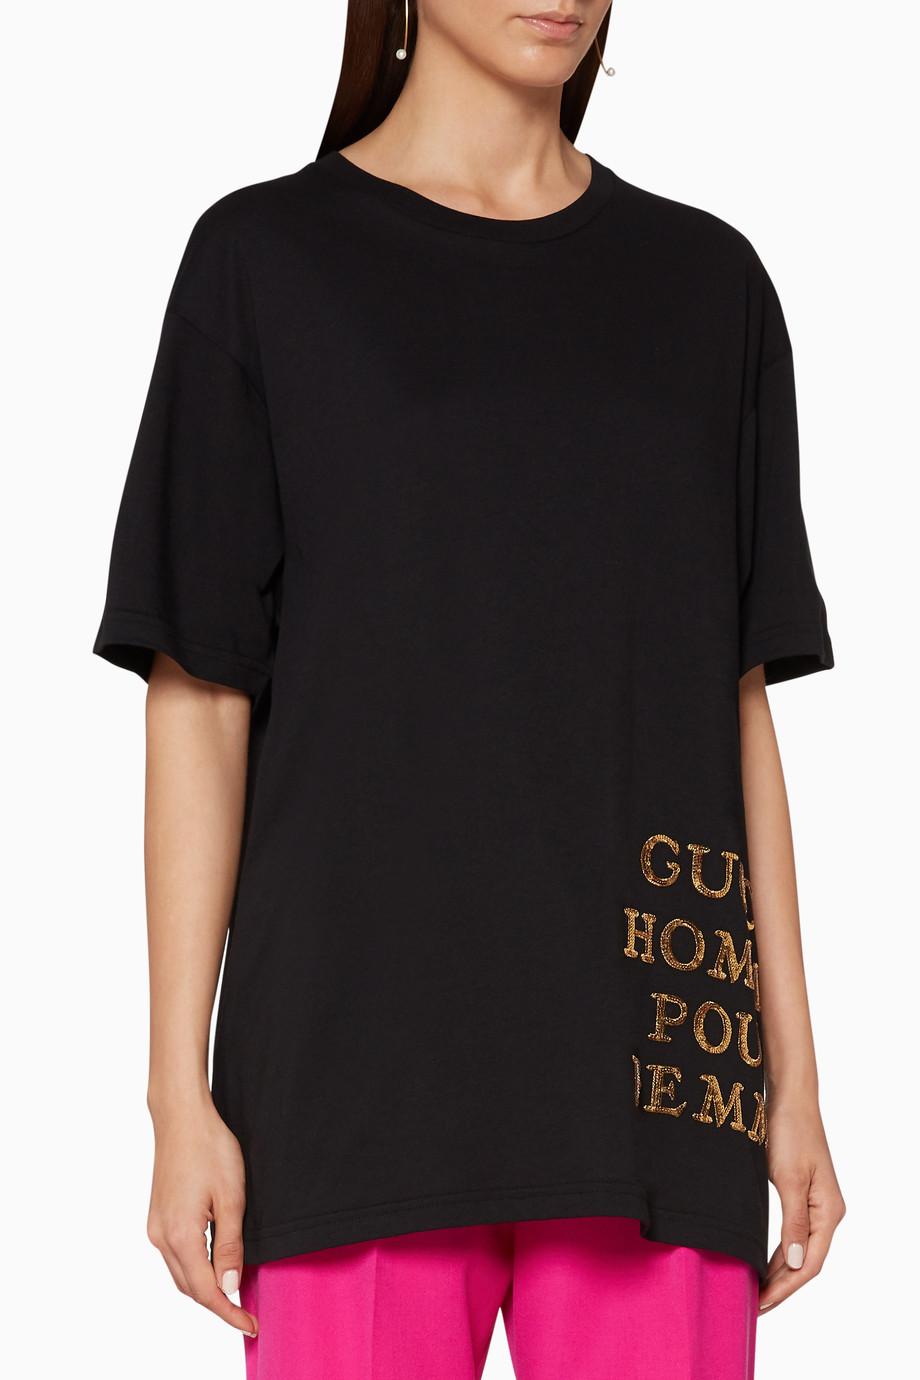 b585badd2fb Shop Gucci Black Oversized T-Shirt for Women